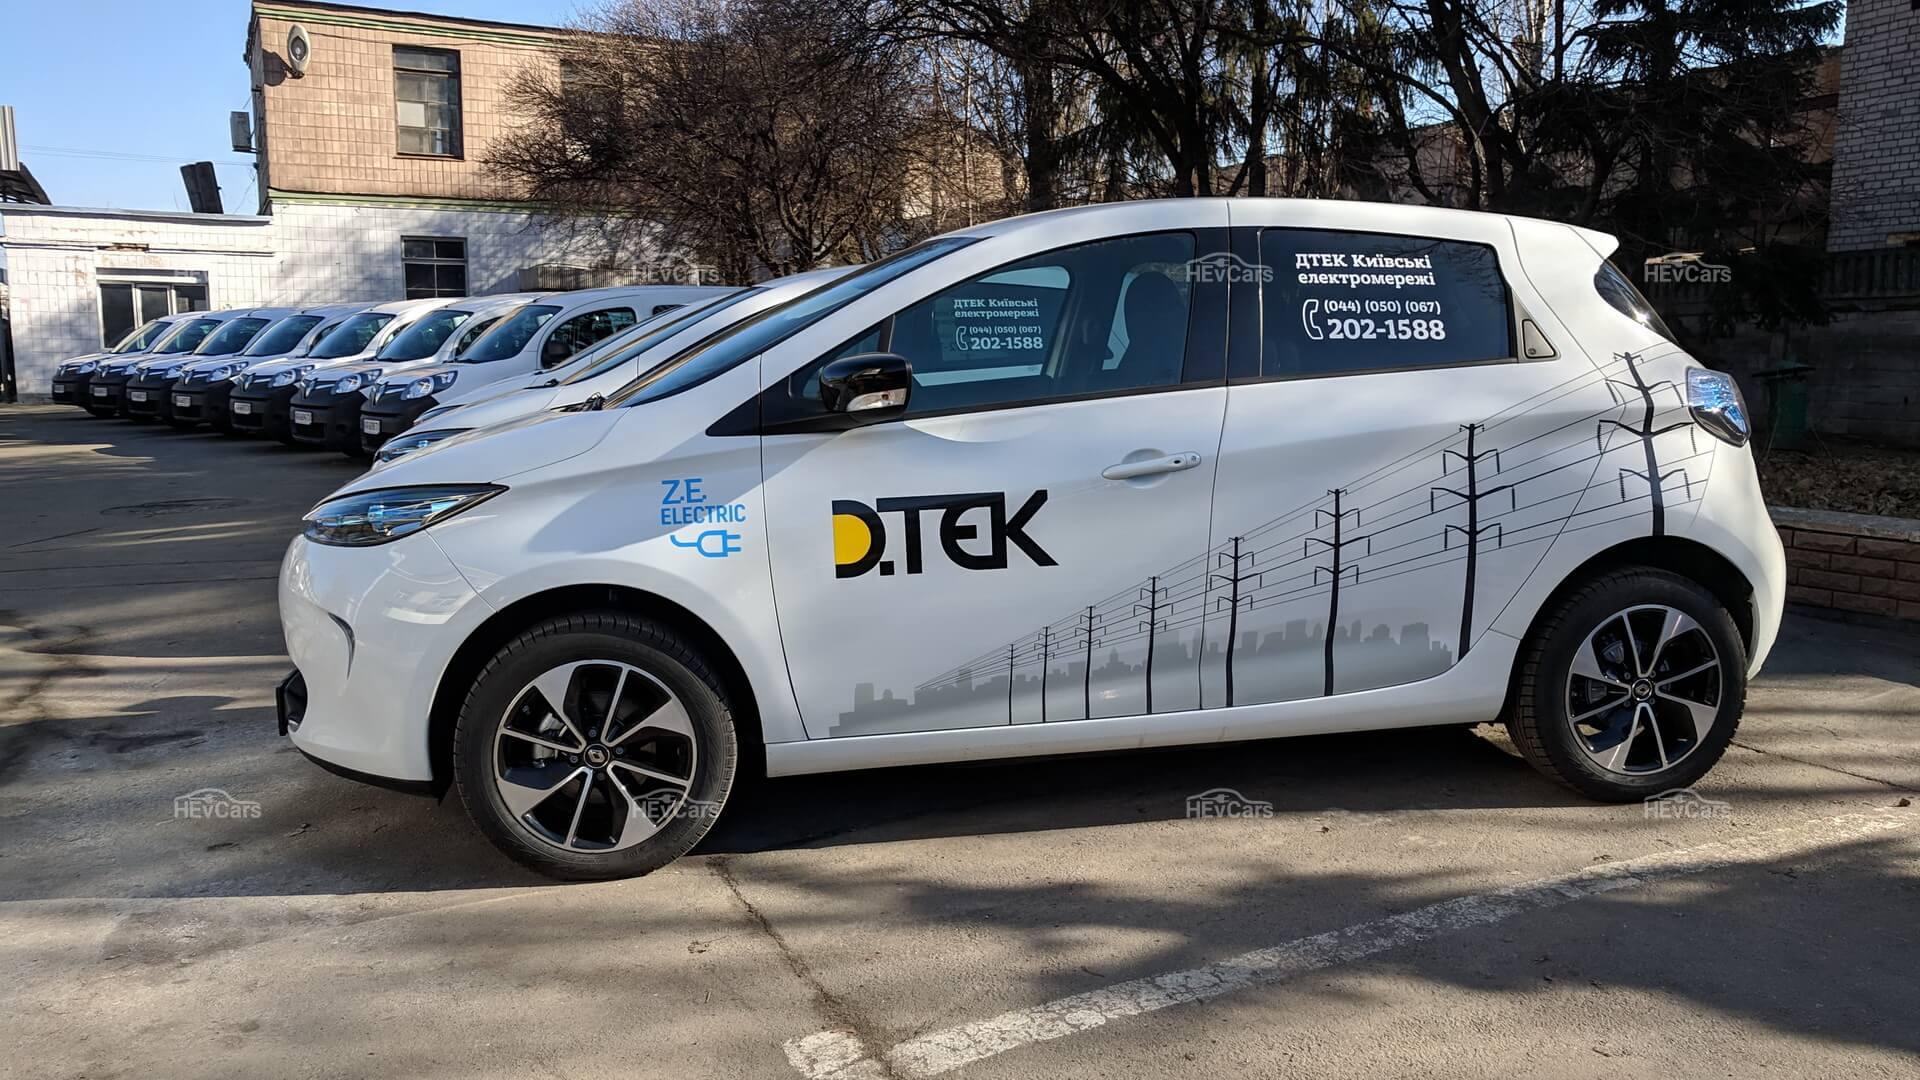 11электромобилей Renault ZOE иRenault Kangoo Z.E. компании «ДТЭК Киевские электросети»